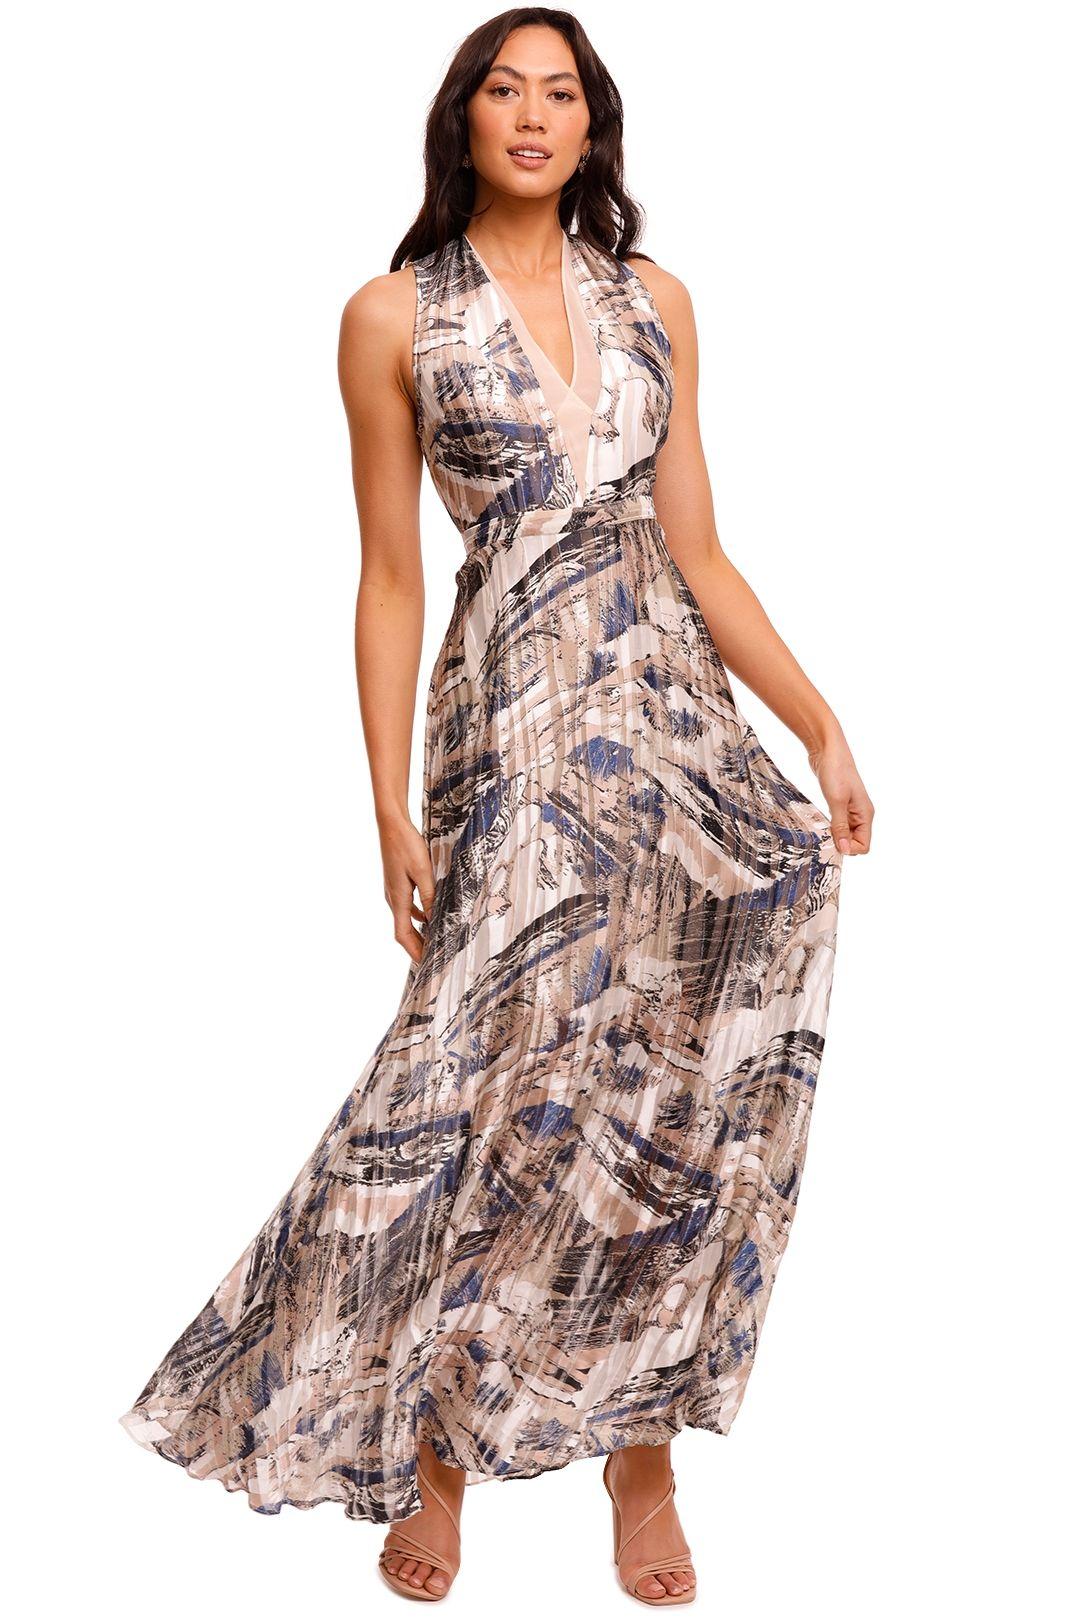 Reiss Marble Maxi Dress plunge v neck